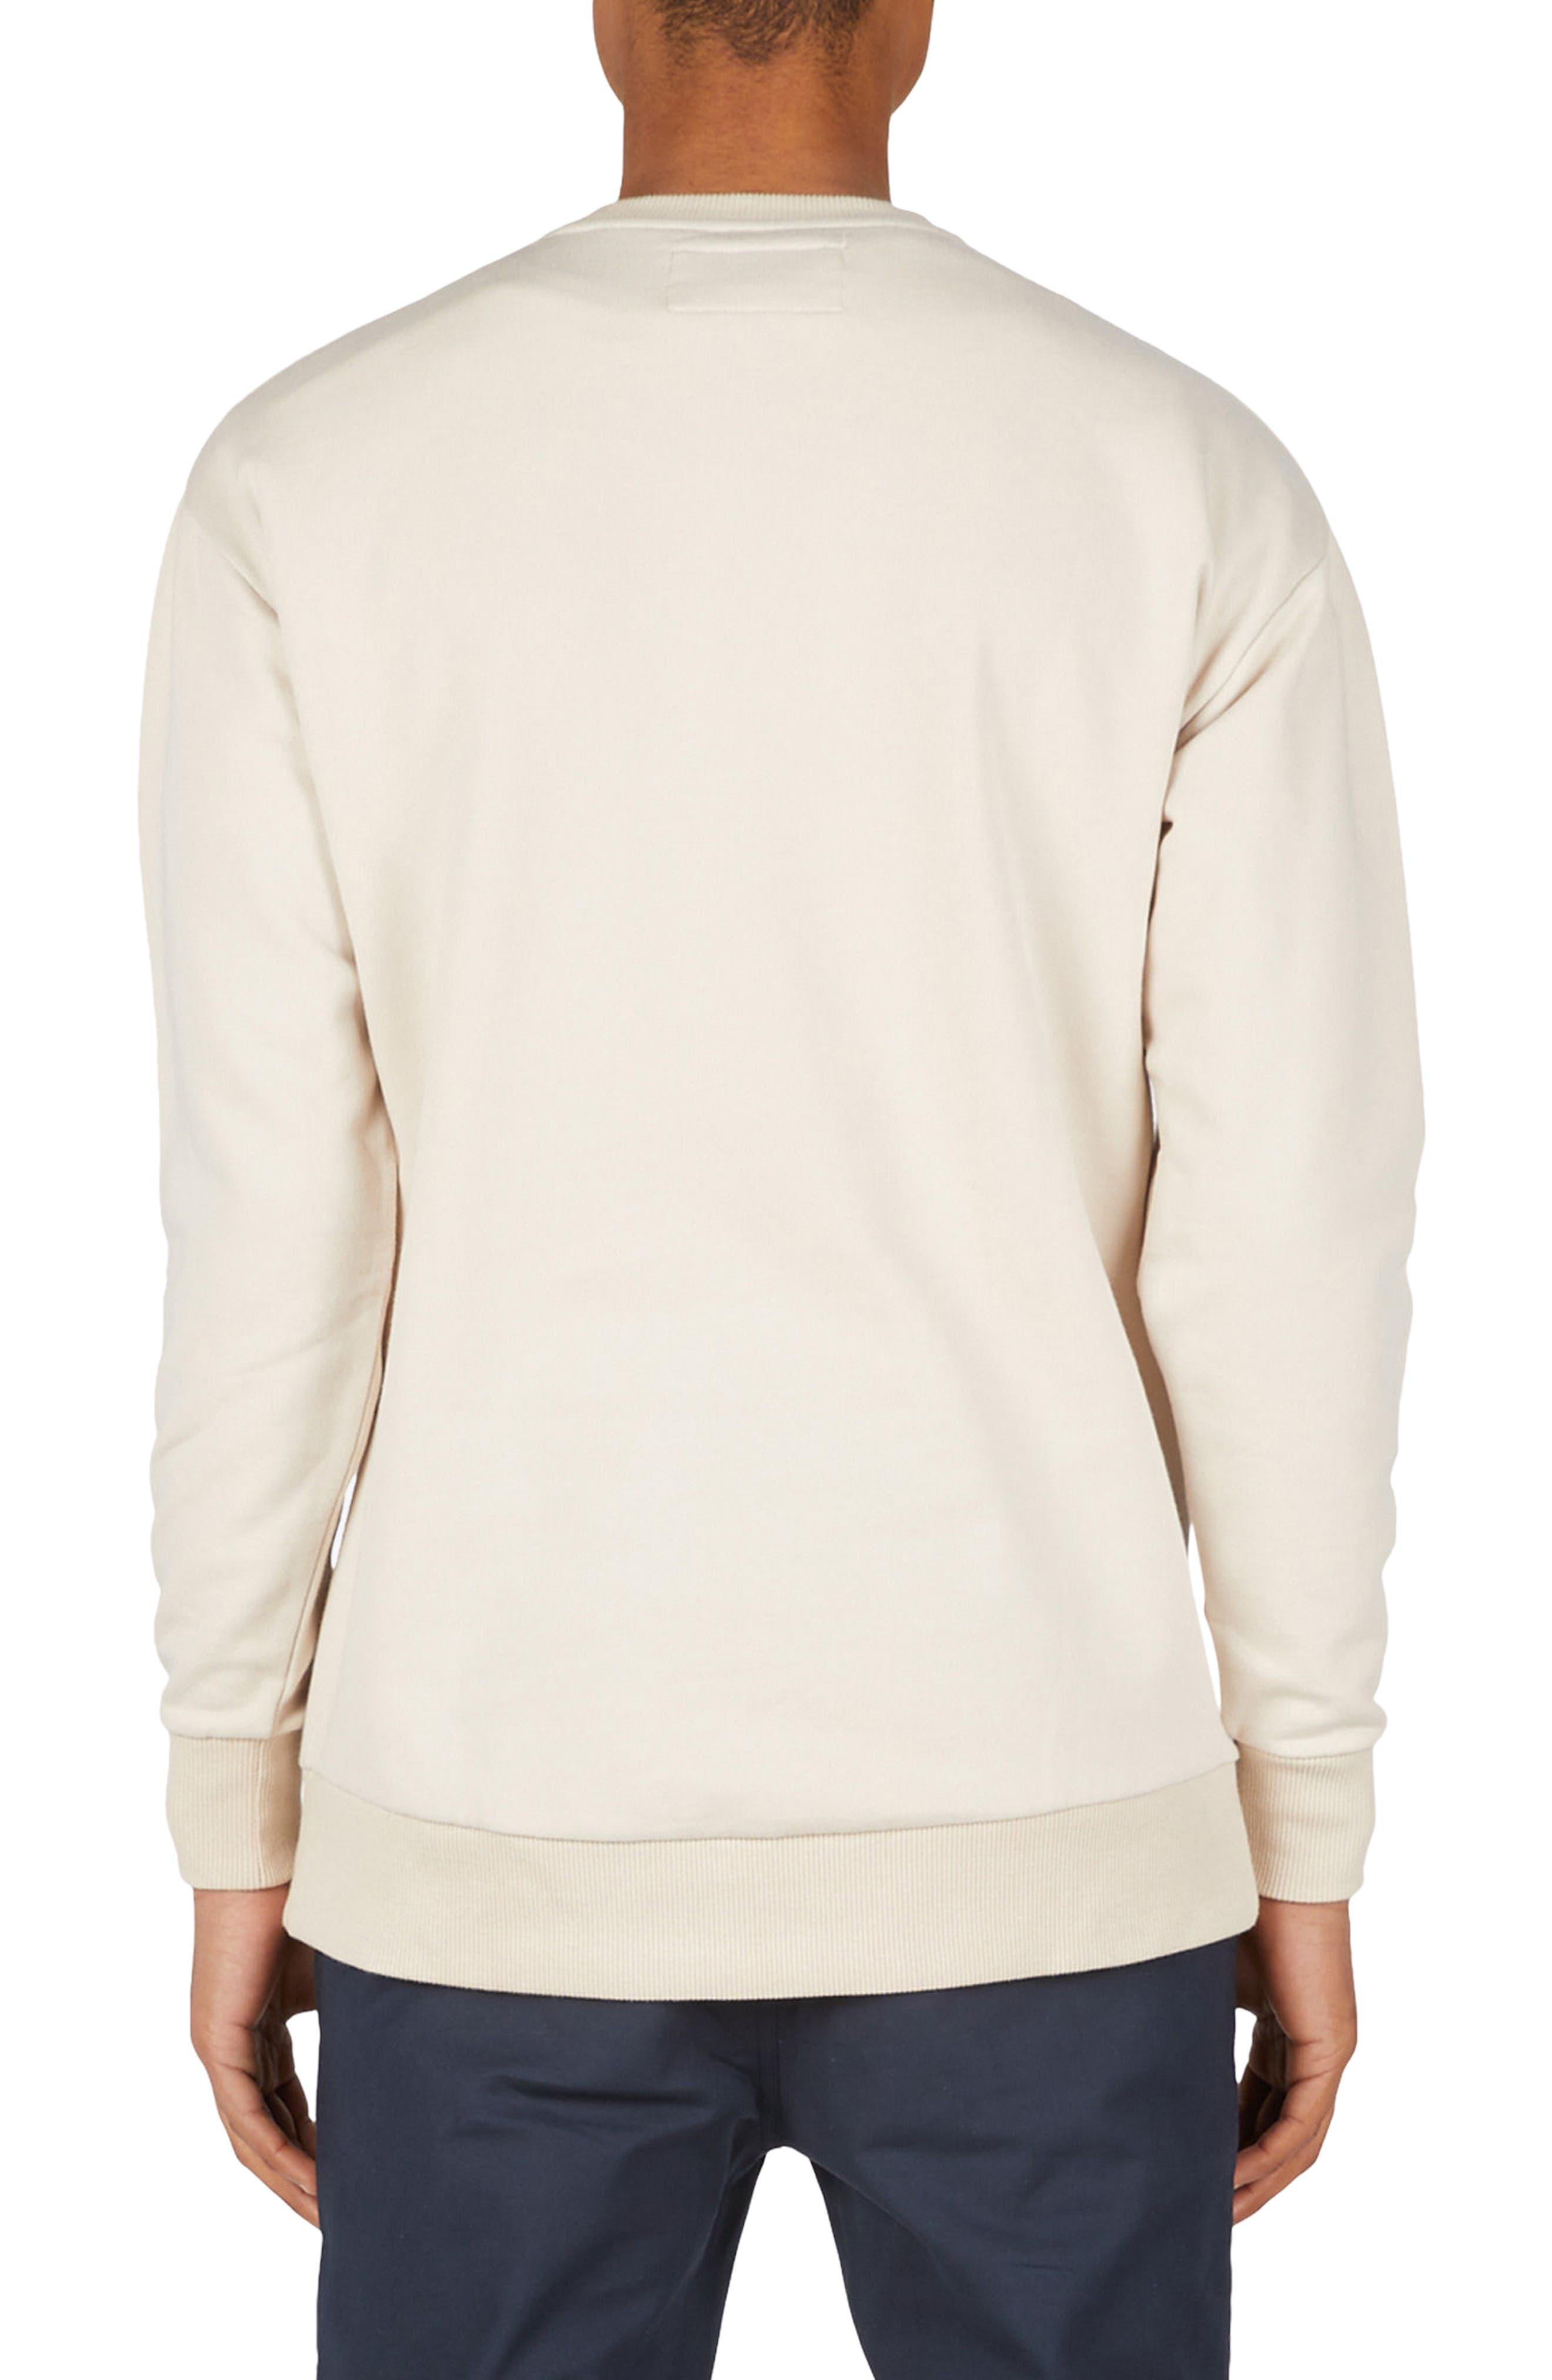 Sponsor Rugger Sweatshirt,                             Alternate thumbnail 2, color,                             Natural